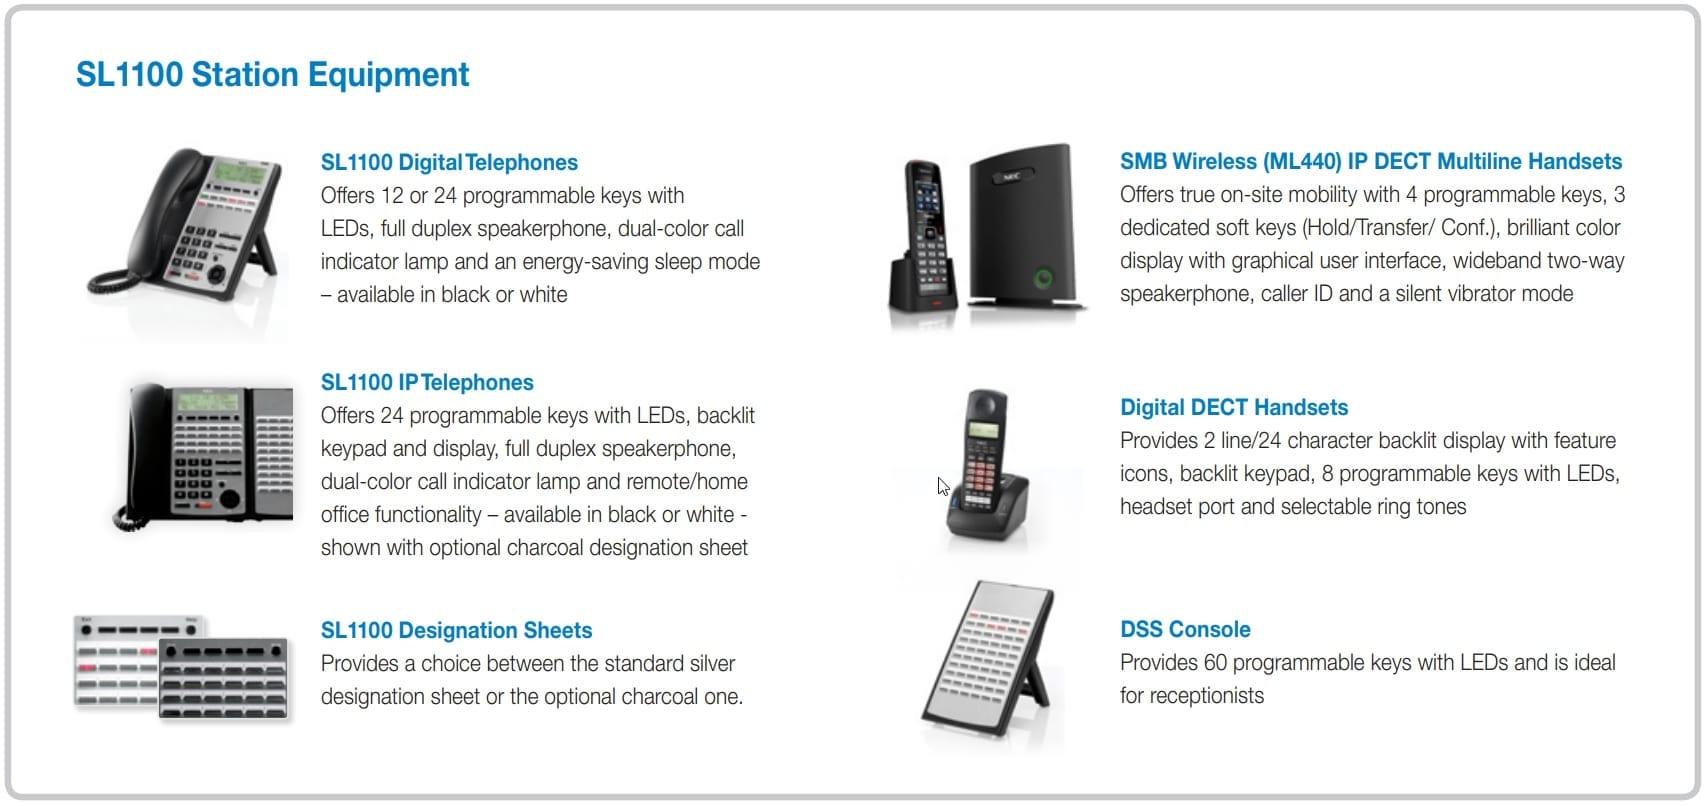 Pyer Phone Systems Melbourne - NEC - SL1100 PBX System Equiment list